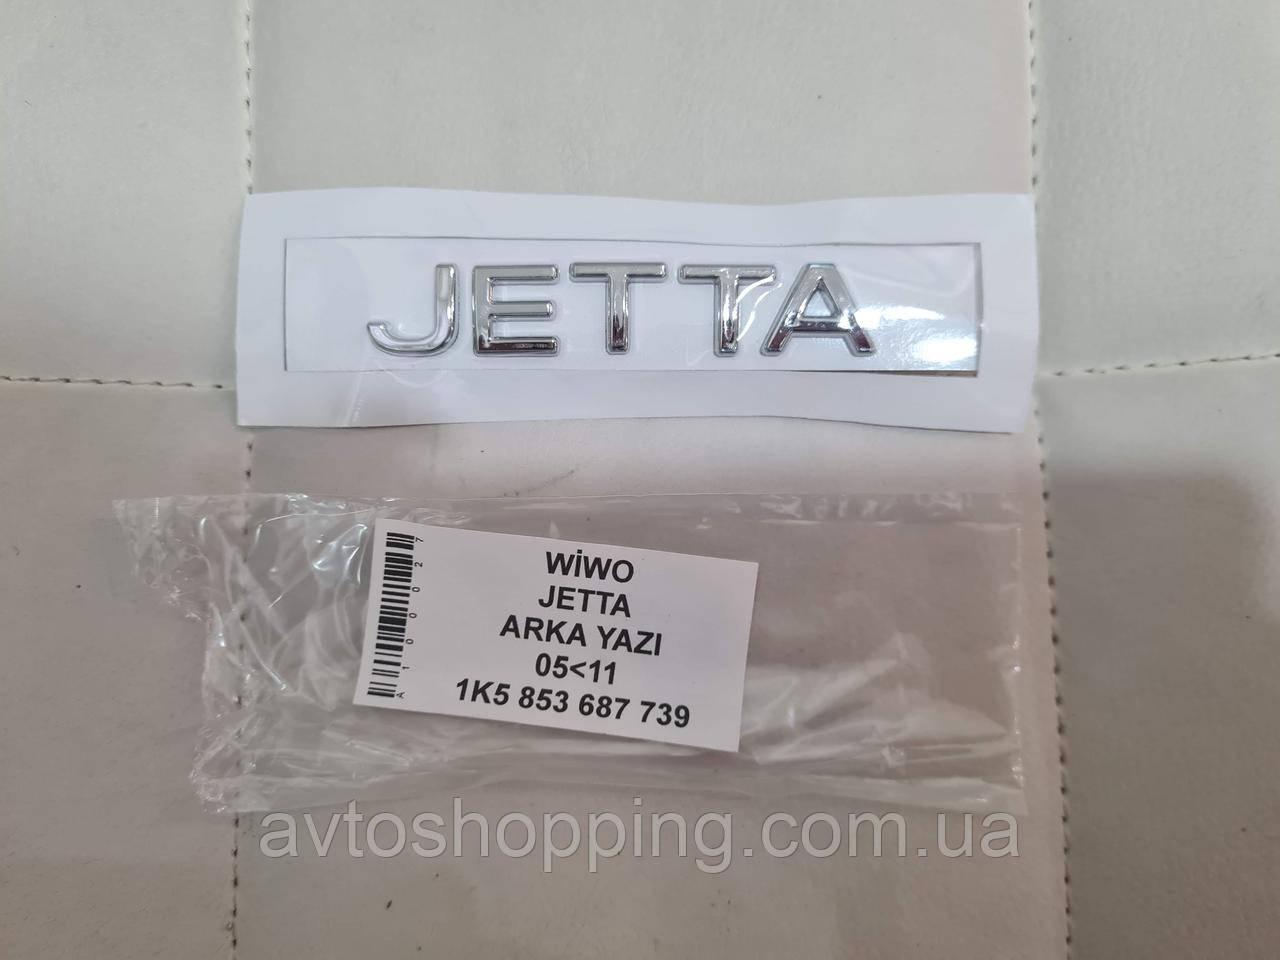 "Емблема напис на багажник радіатор Volkswagen VW JETTA"" (05-11) , 1K5 853 687 739"